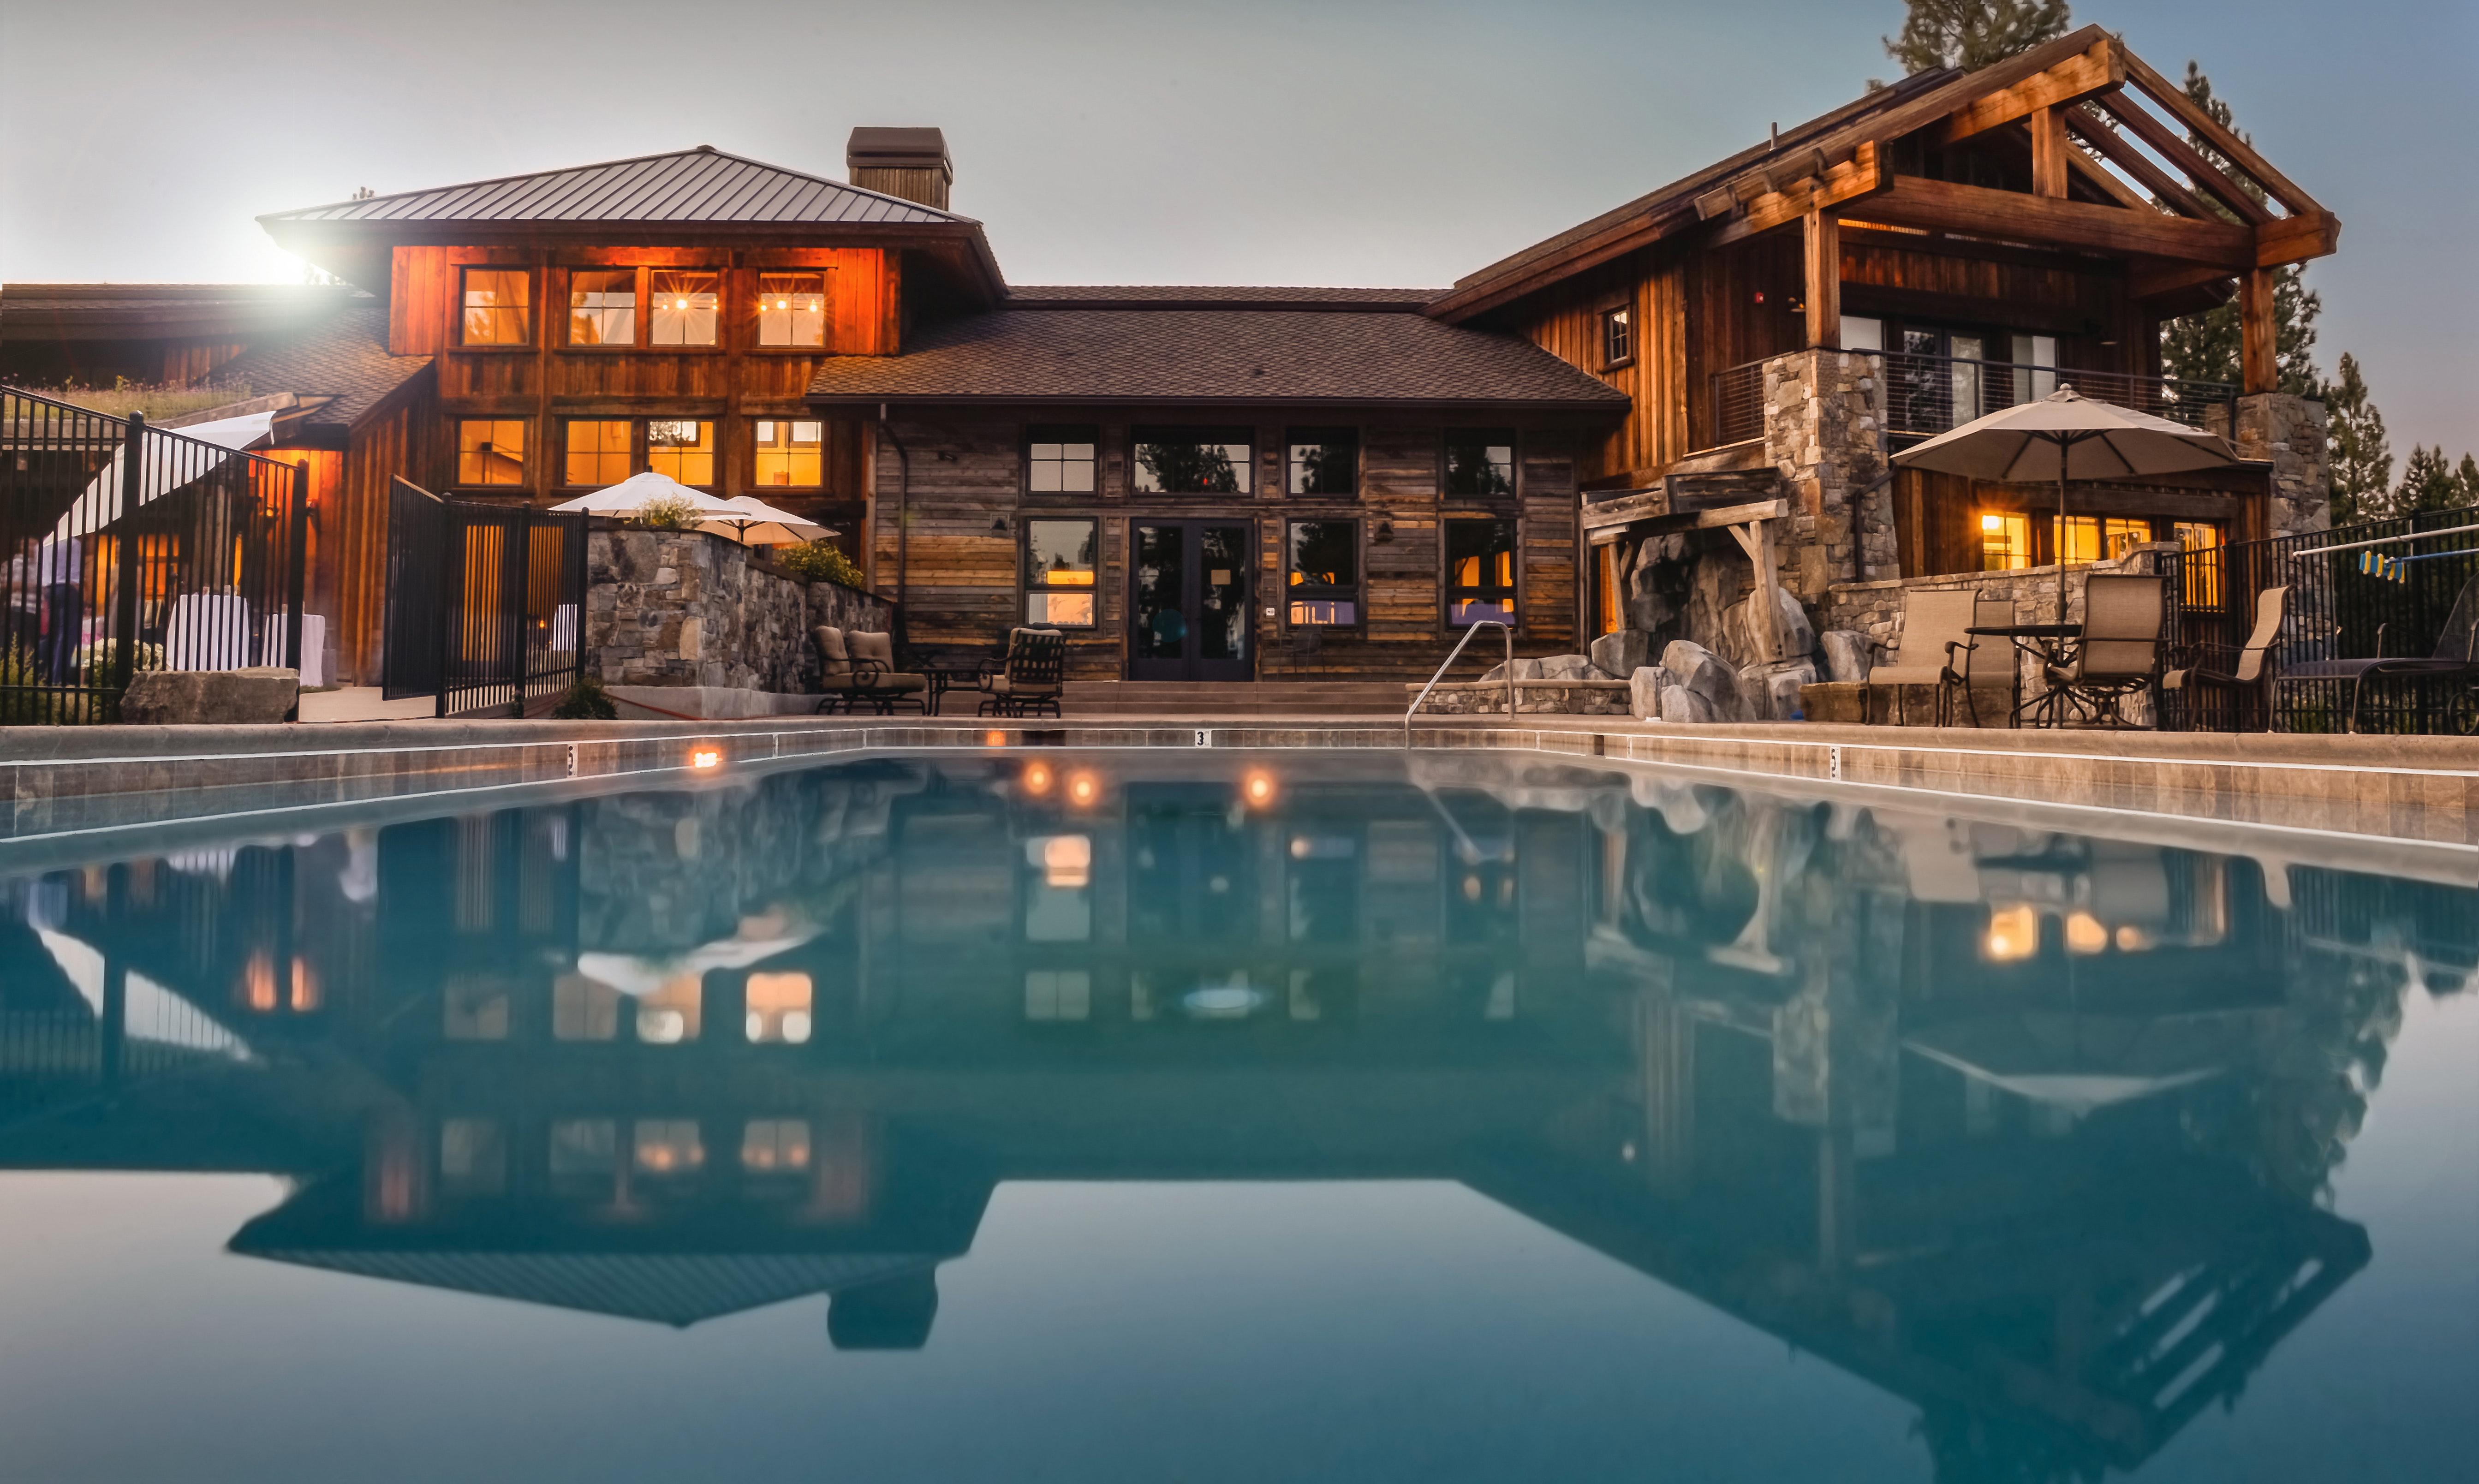 backyard-lights-mansion-32870